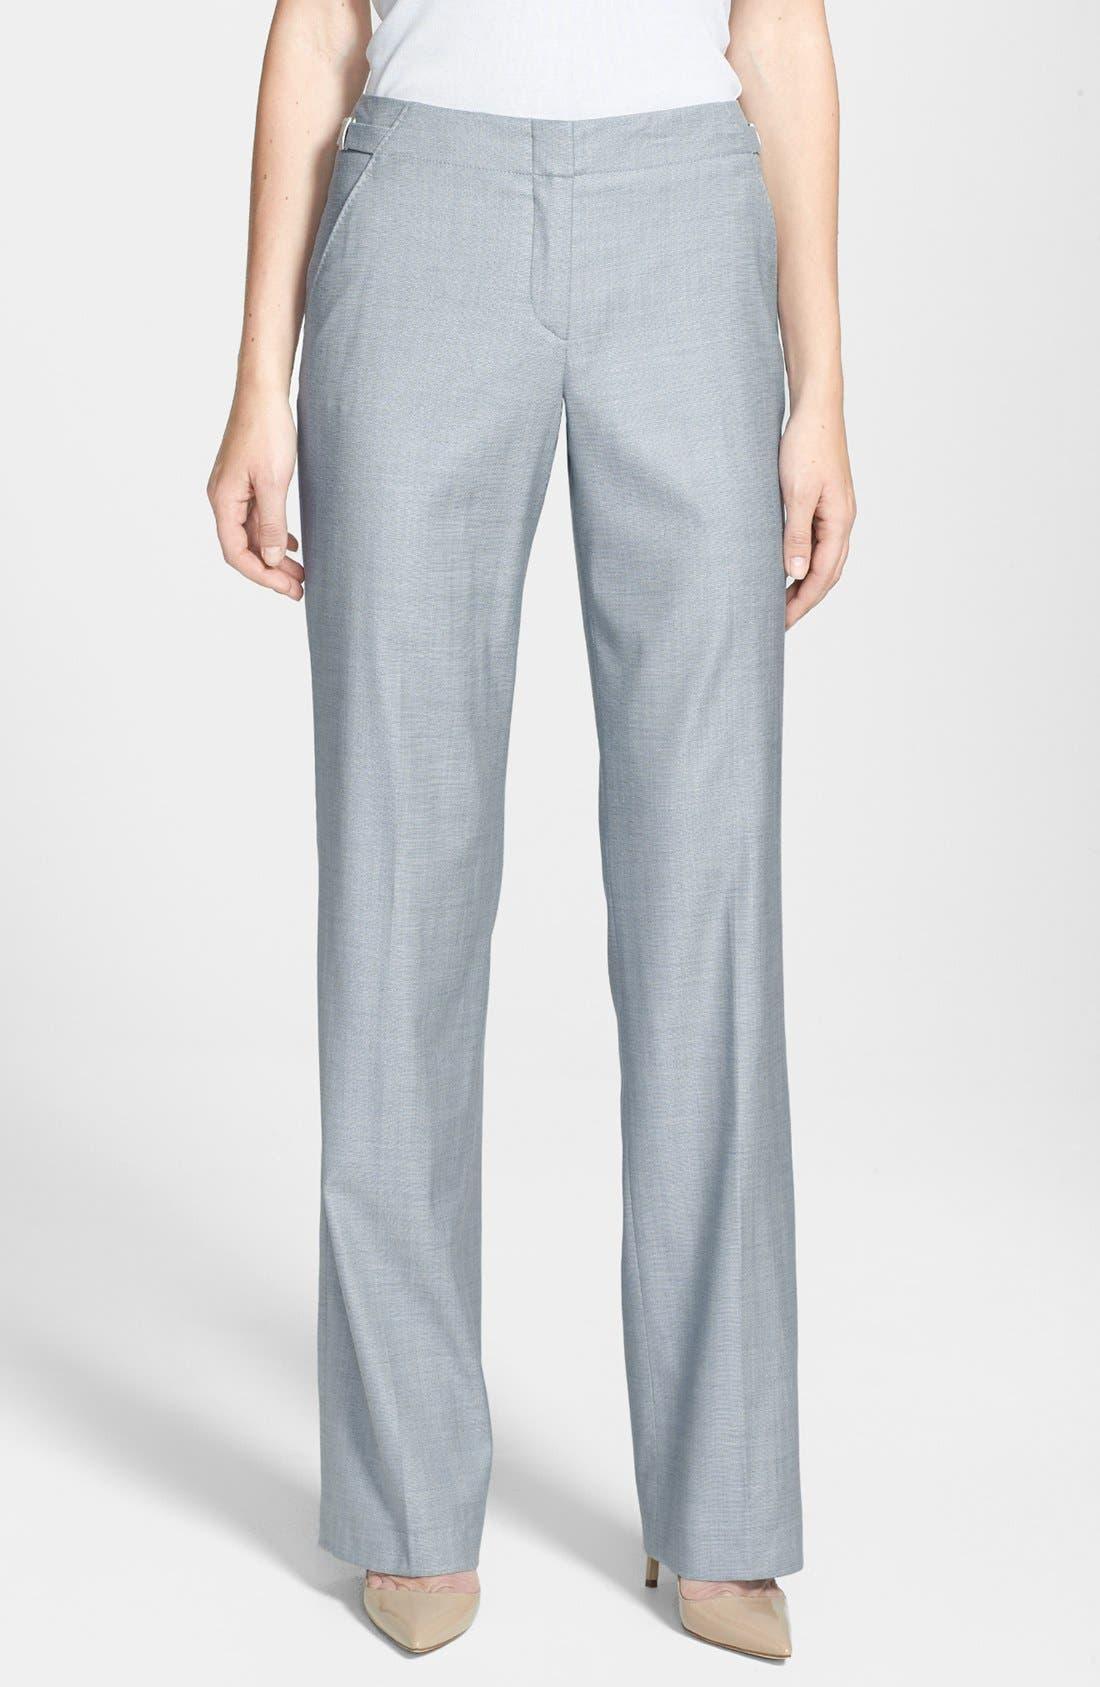 Alternate Image 1 Selected - BOSS HUGO BOSS 'Tillina' Stretch Wool Blend Trousers